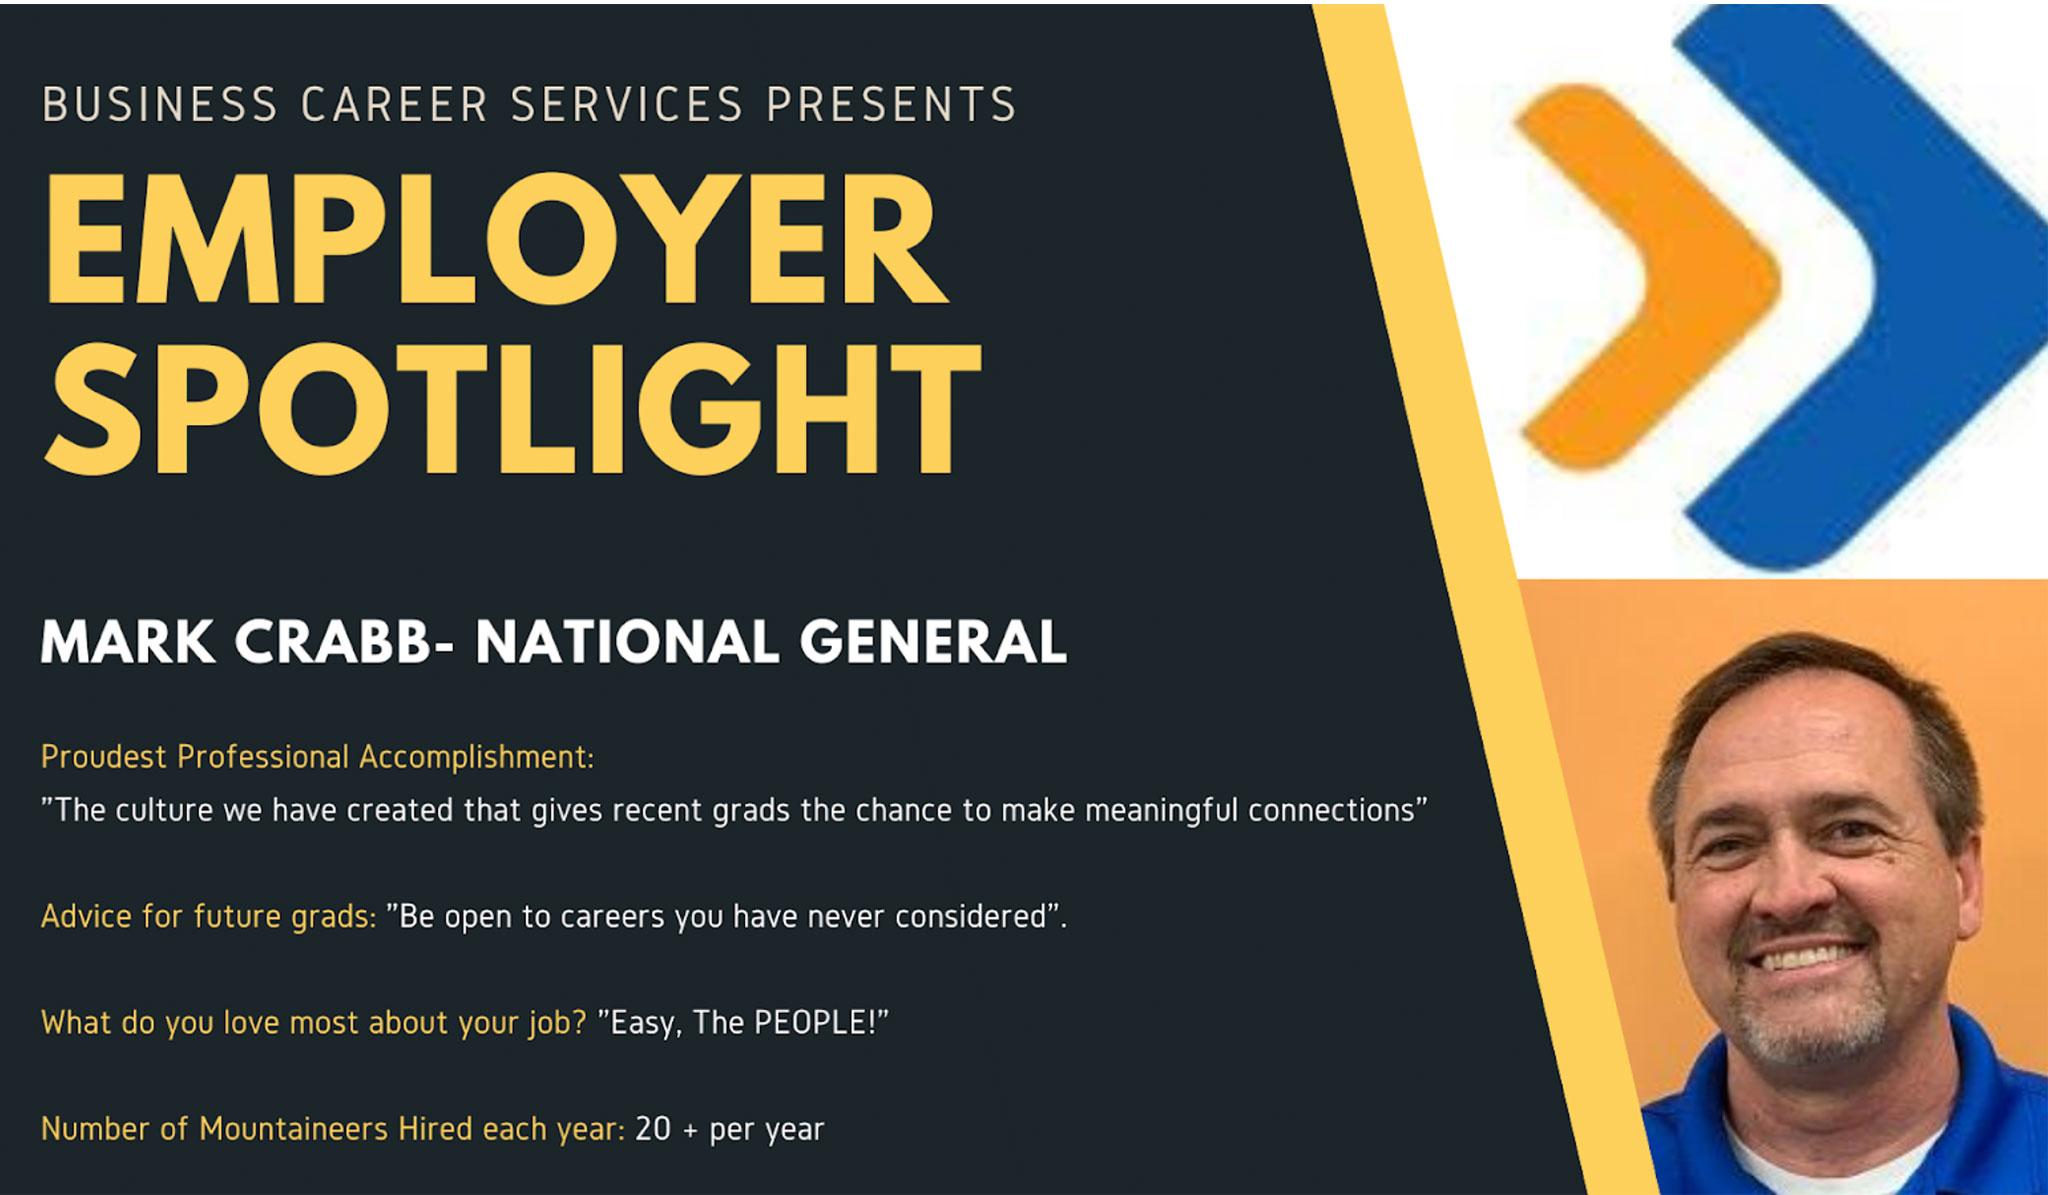 Employer Spotlight: Mark Crabb, National General